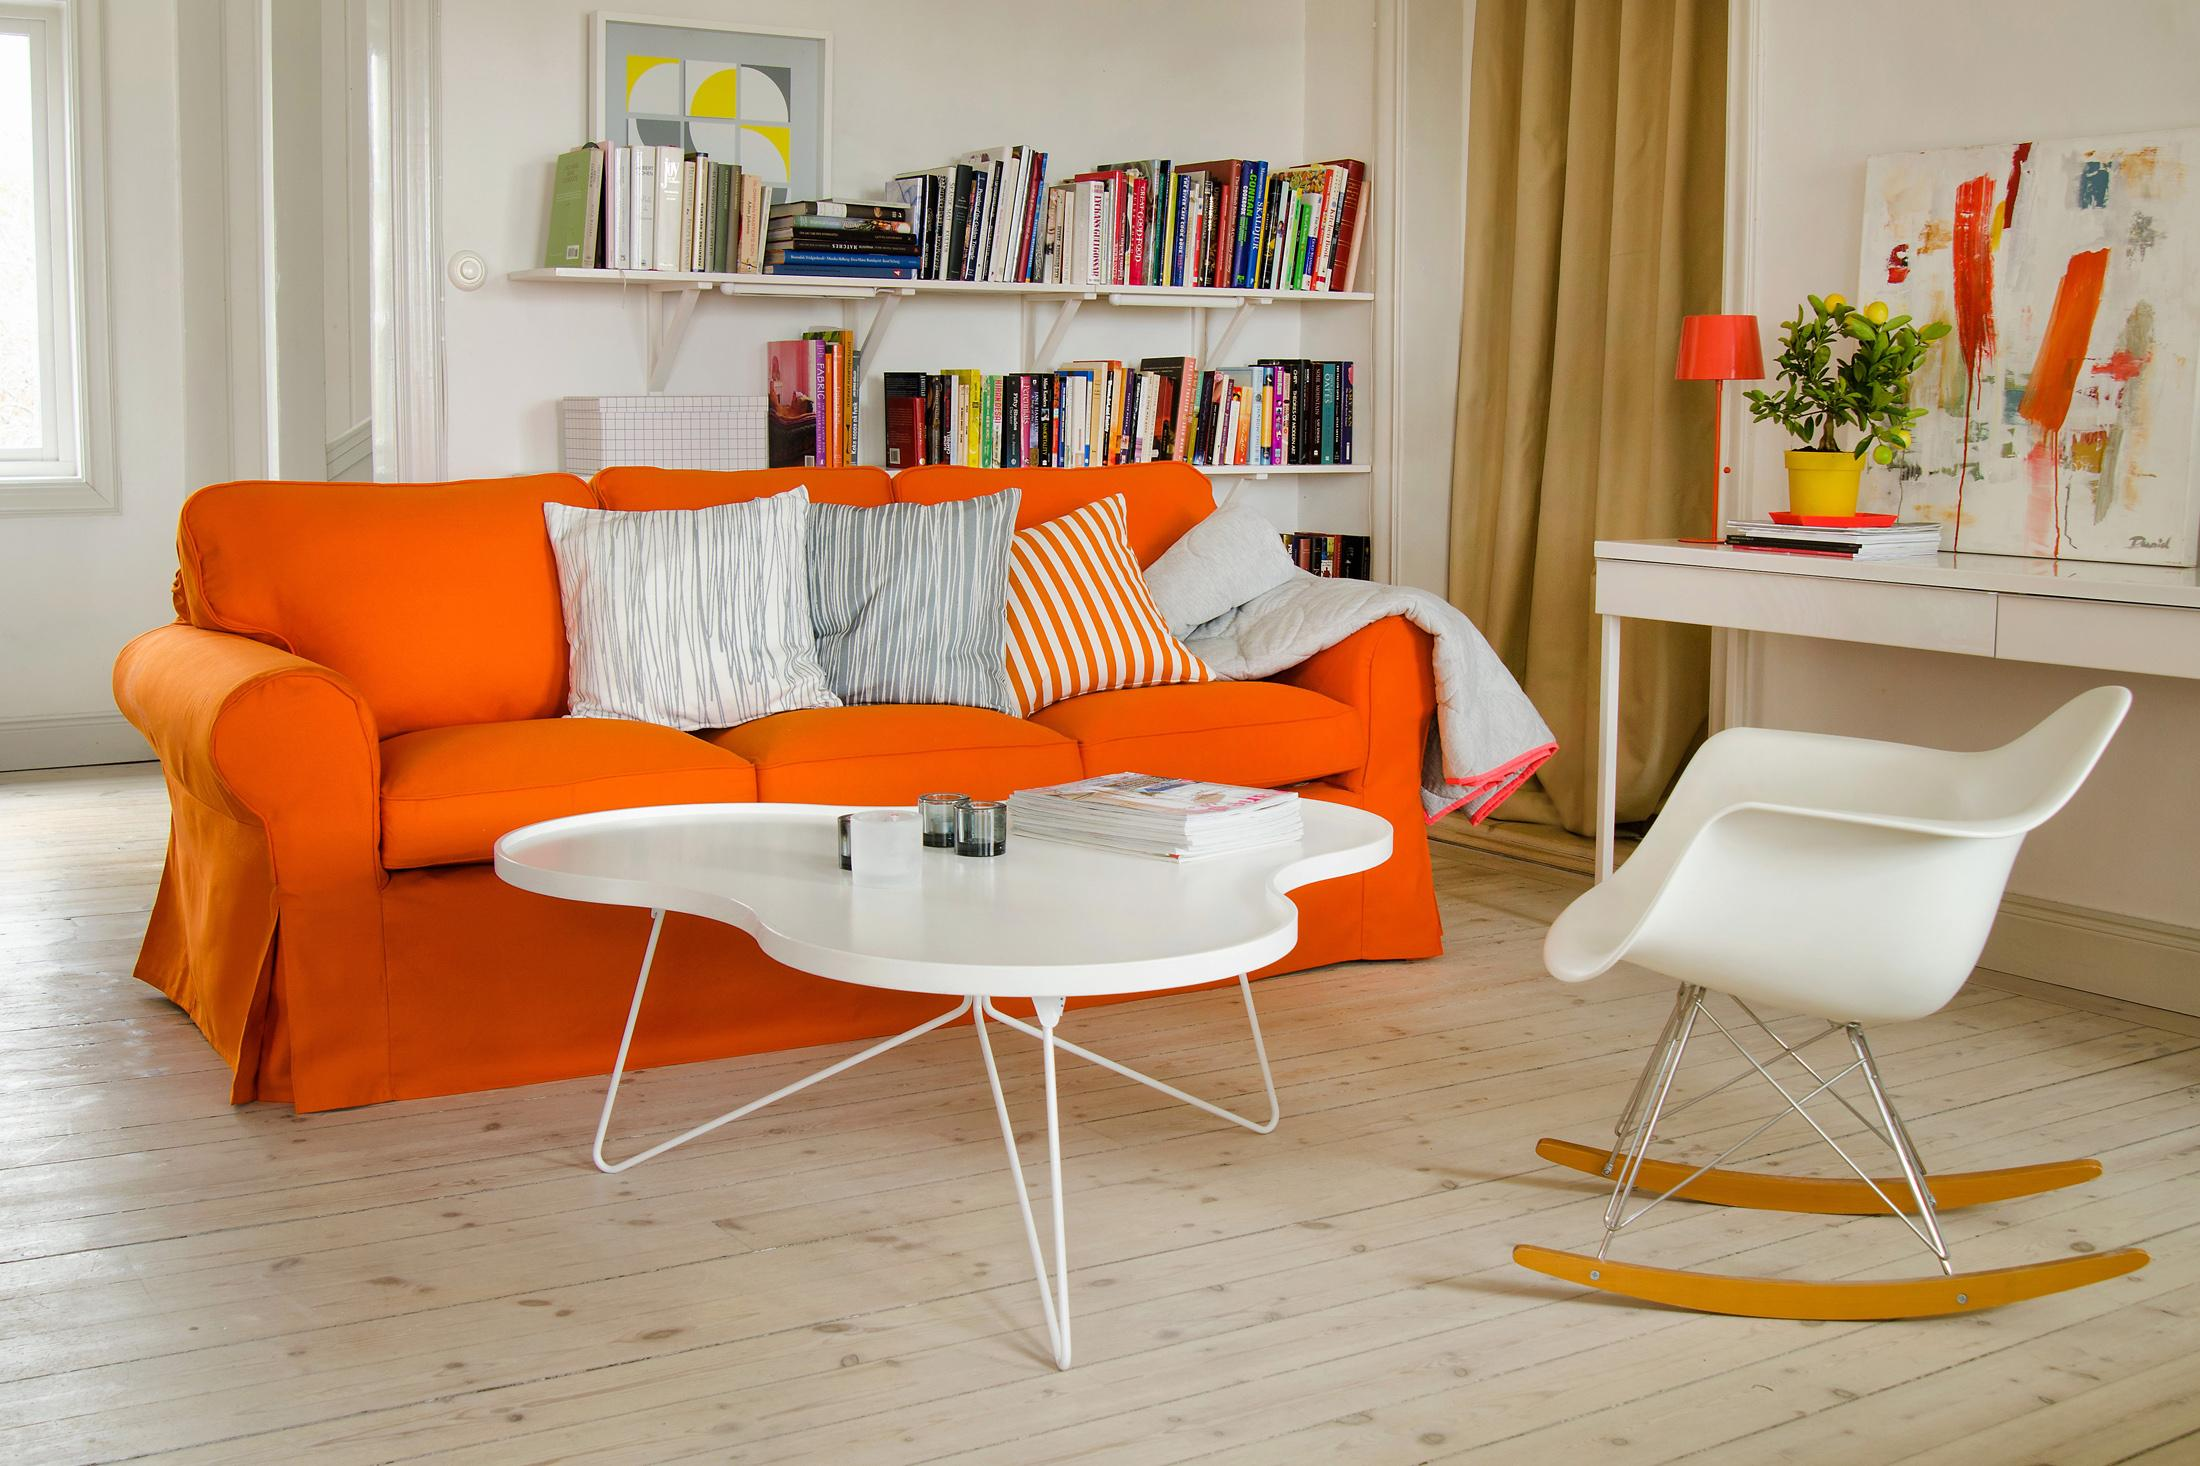 Orangefarbenes Sofa • Bilder & Ideen • Couchstyle